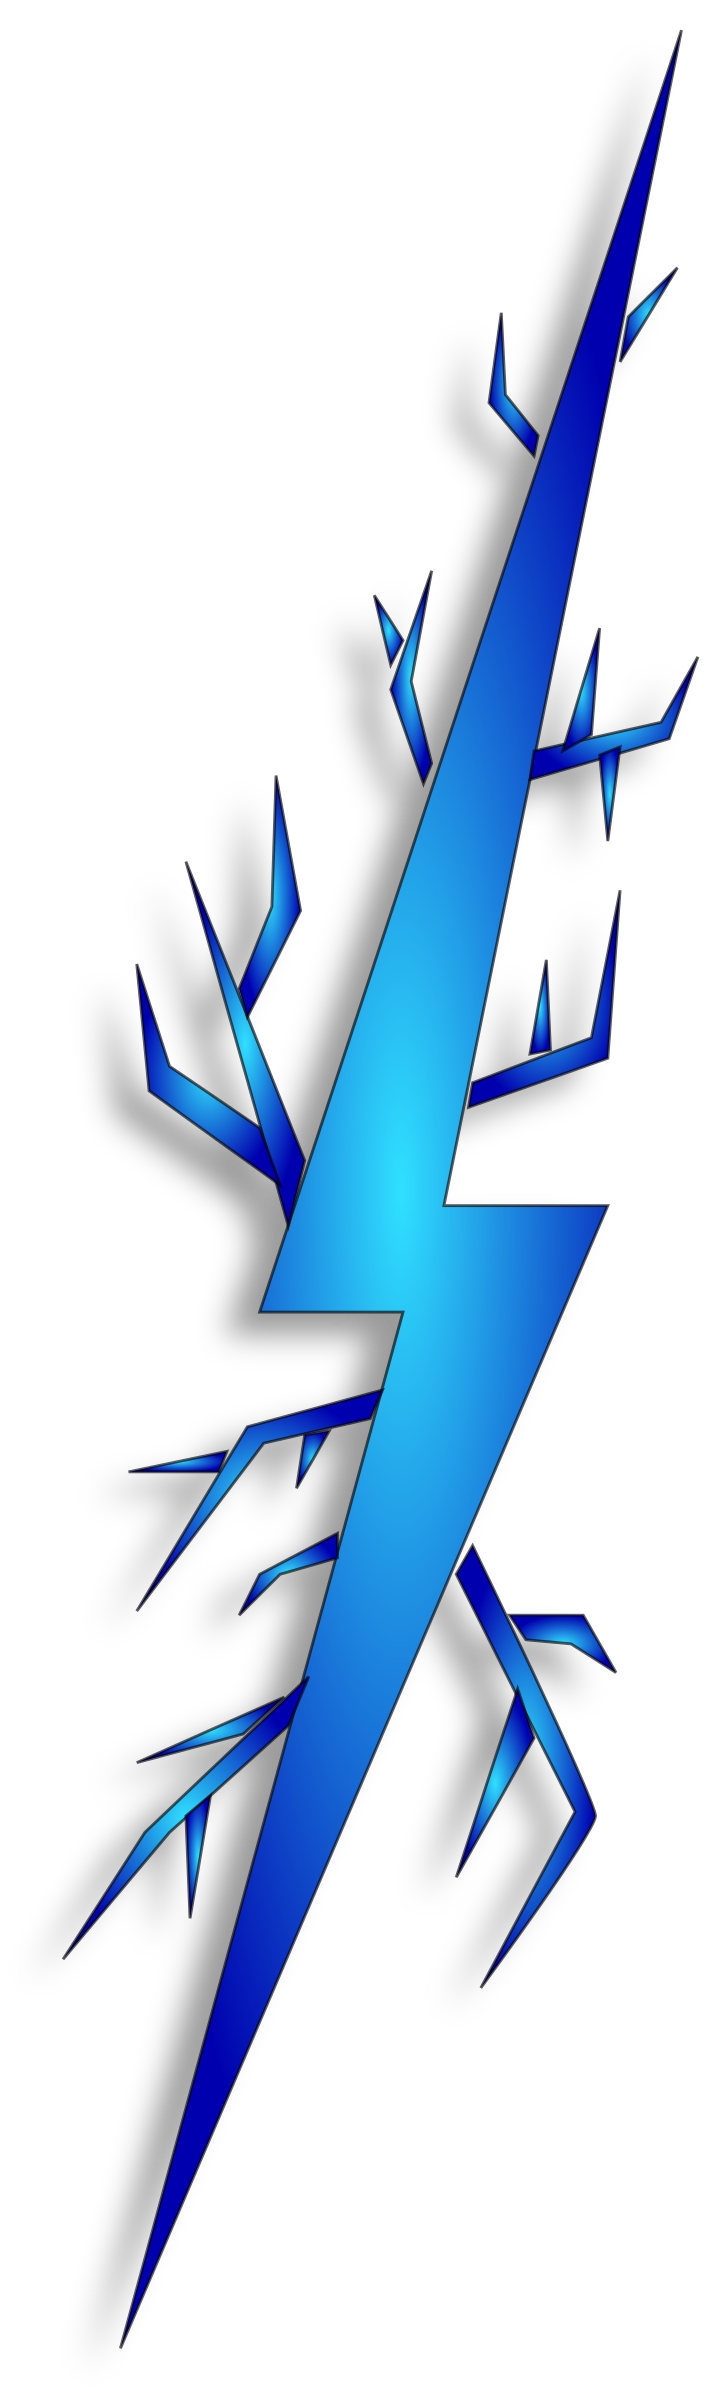 Lightning bolt image clipart .-Lightning bolt image clipart .-11